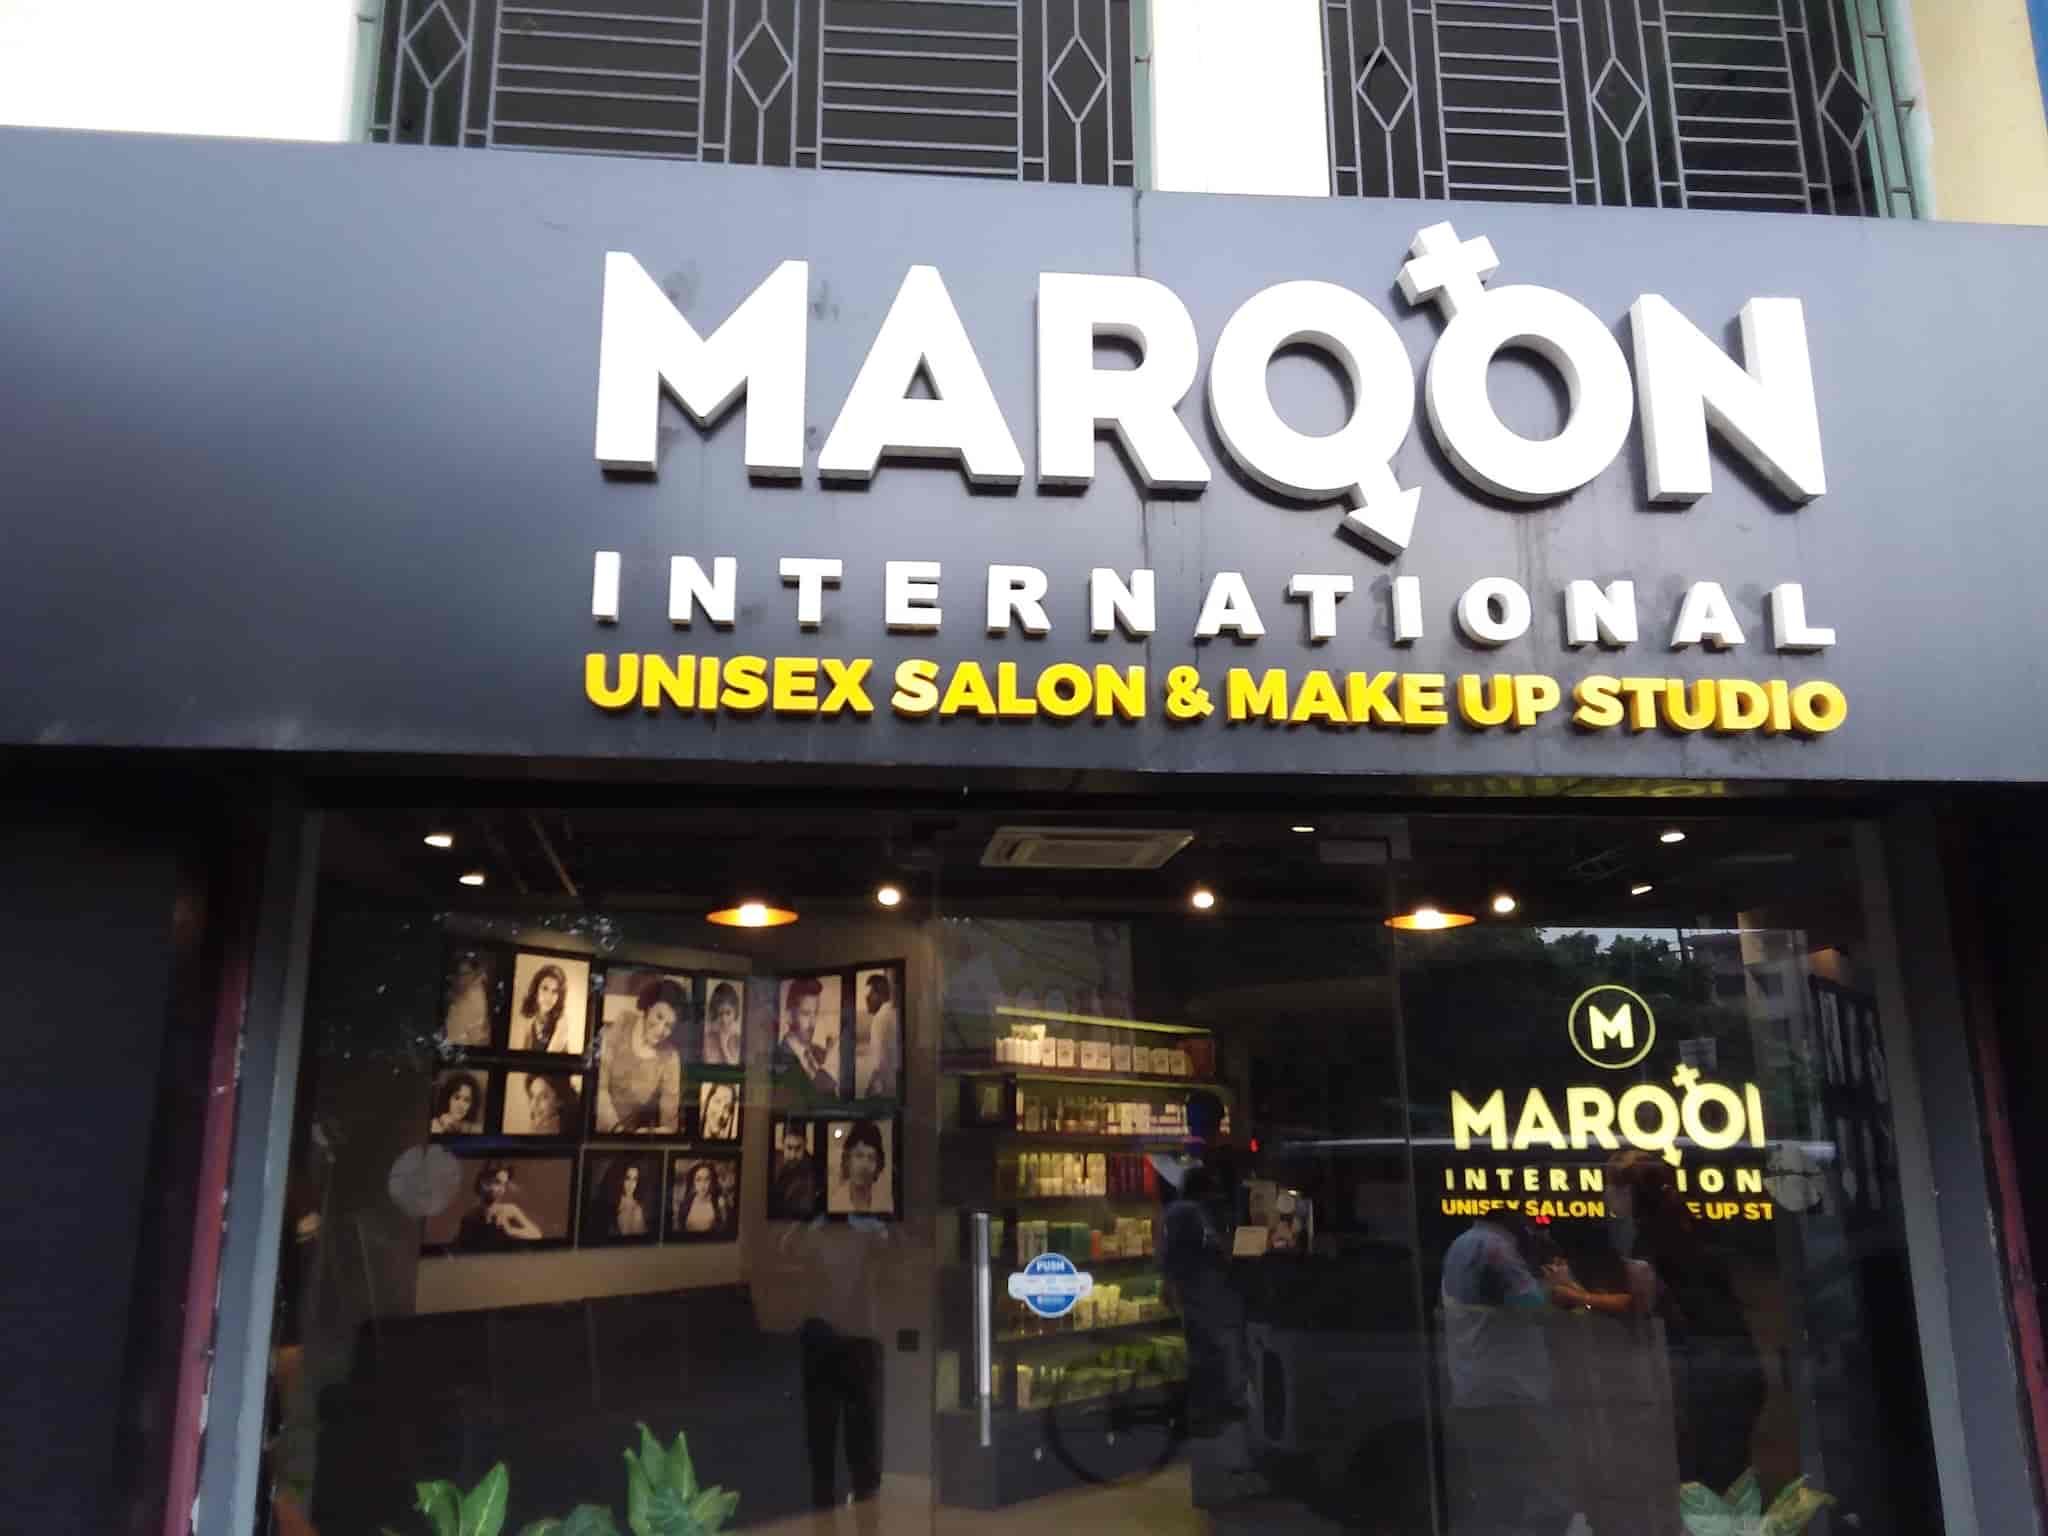 Top 12 Beauty Salons For Men in Kolkata - Best Salons-men - Justdial